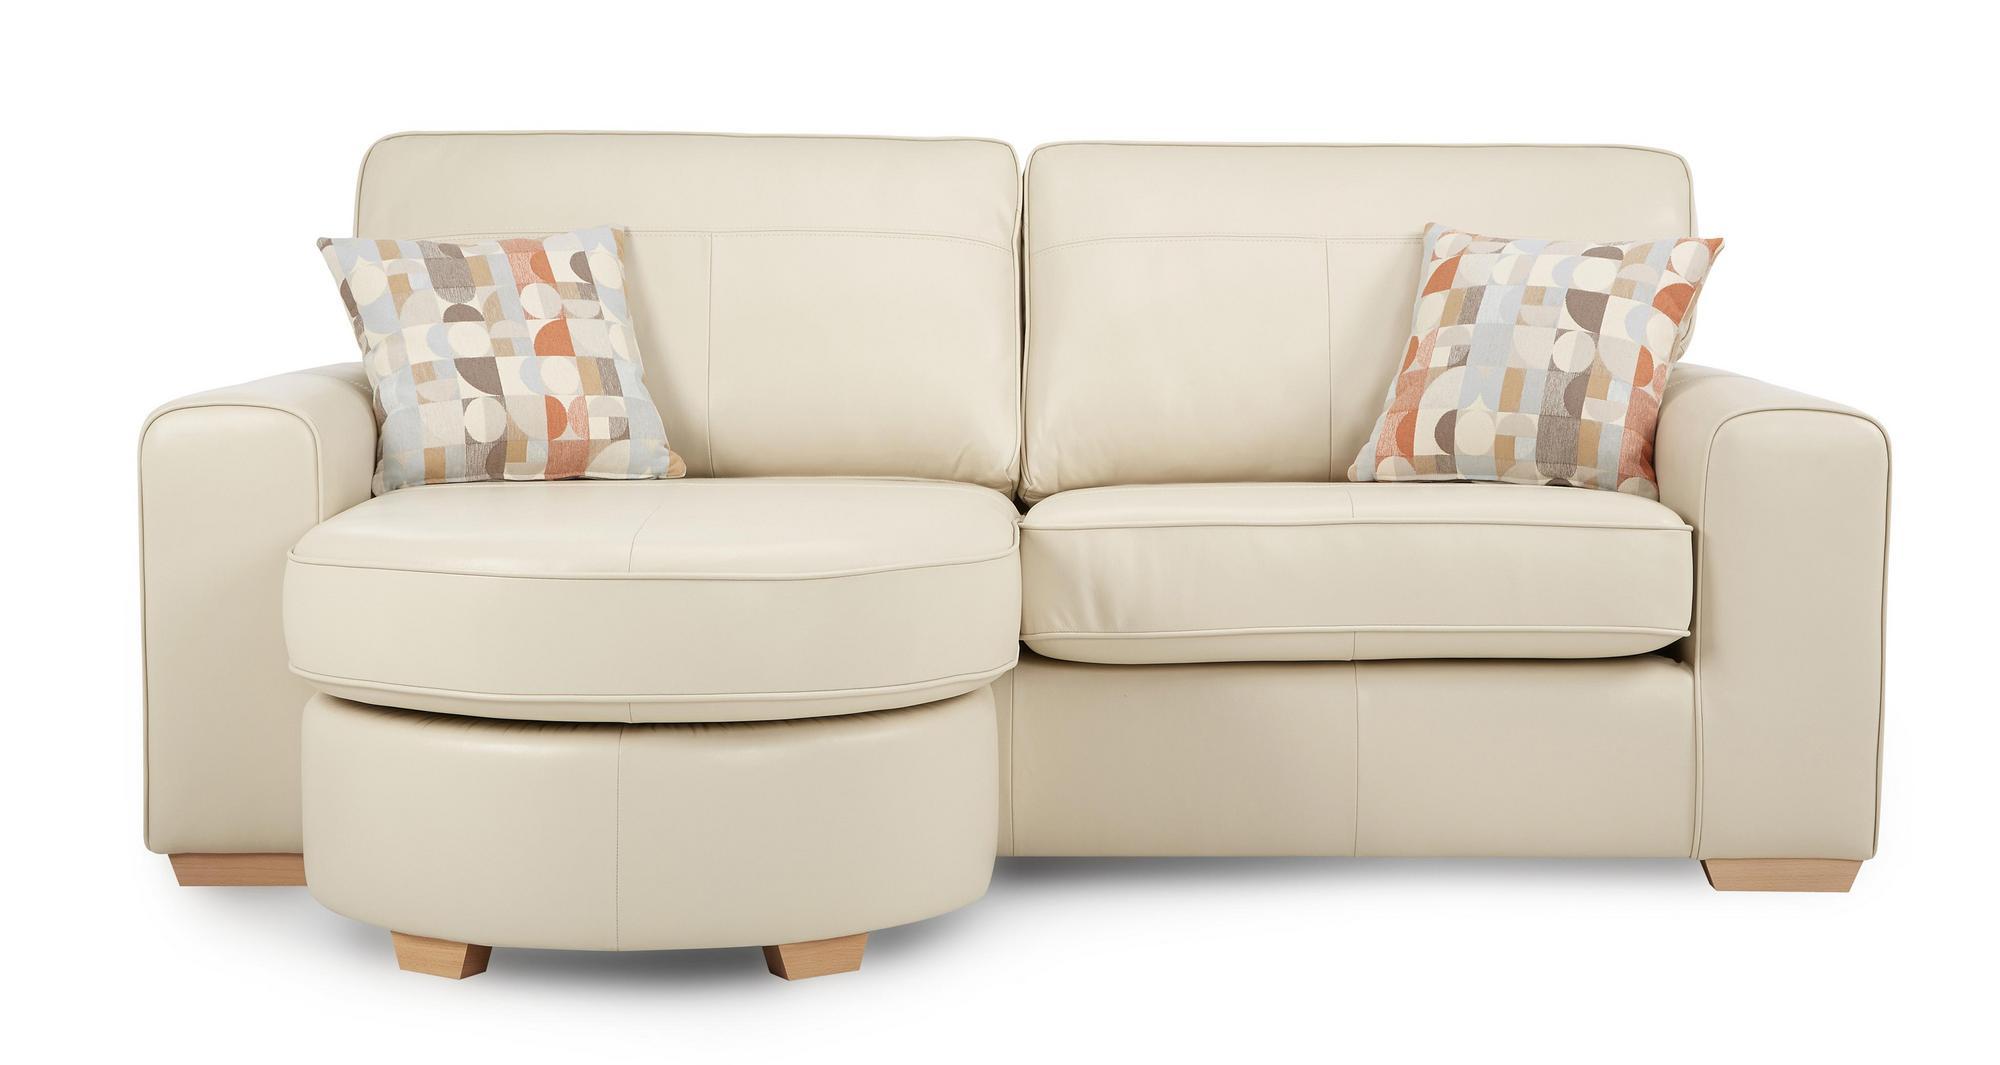 Otis Leather Sofa Set Inc 4 Seater Large Swivel Chair